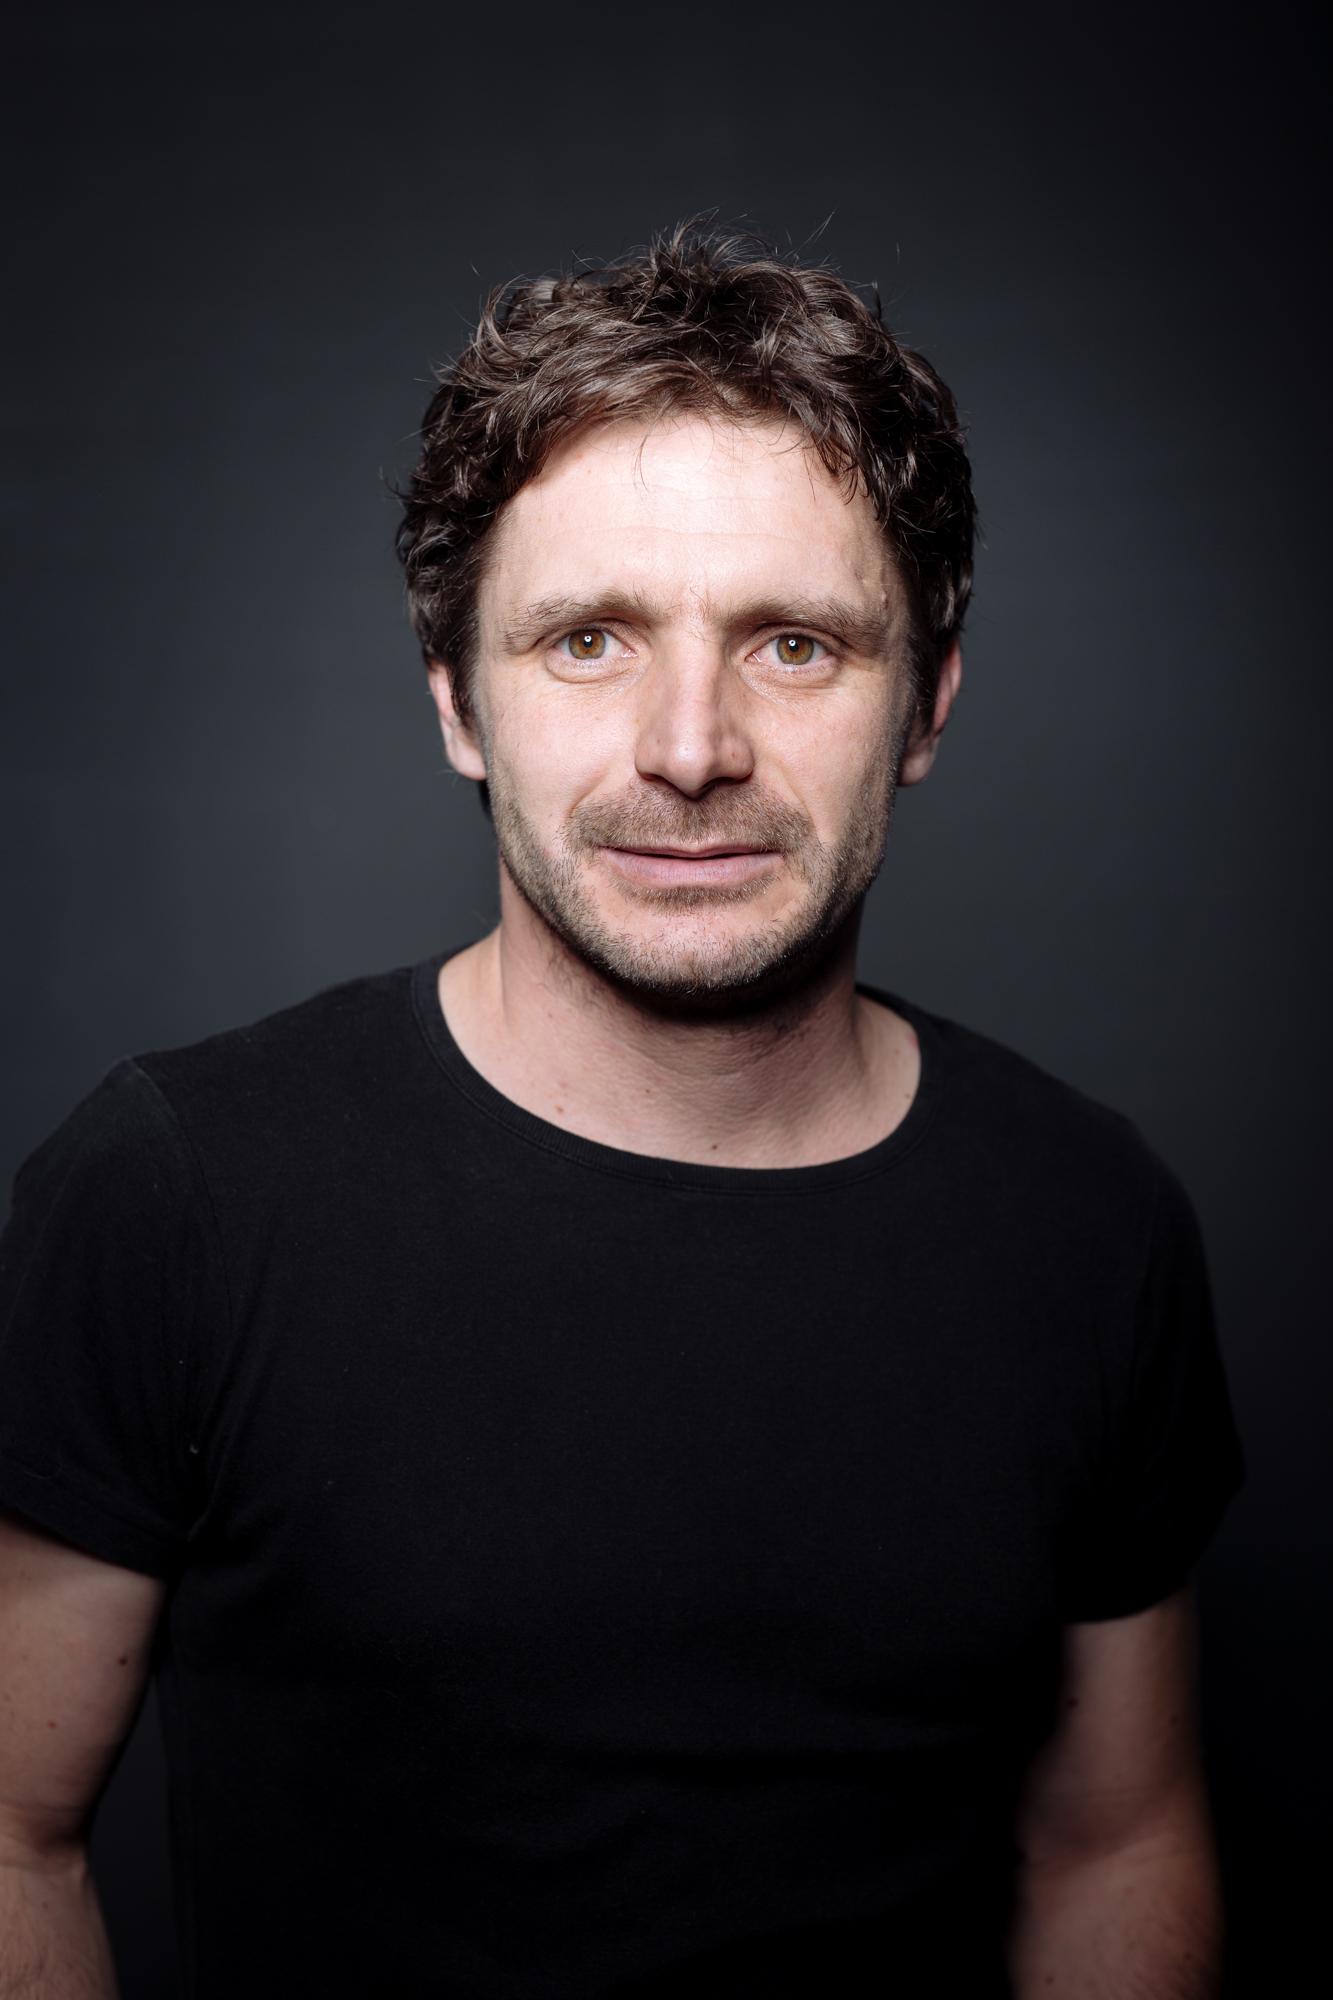 Marius Turdeanu